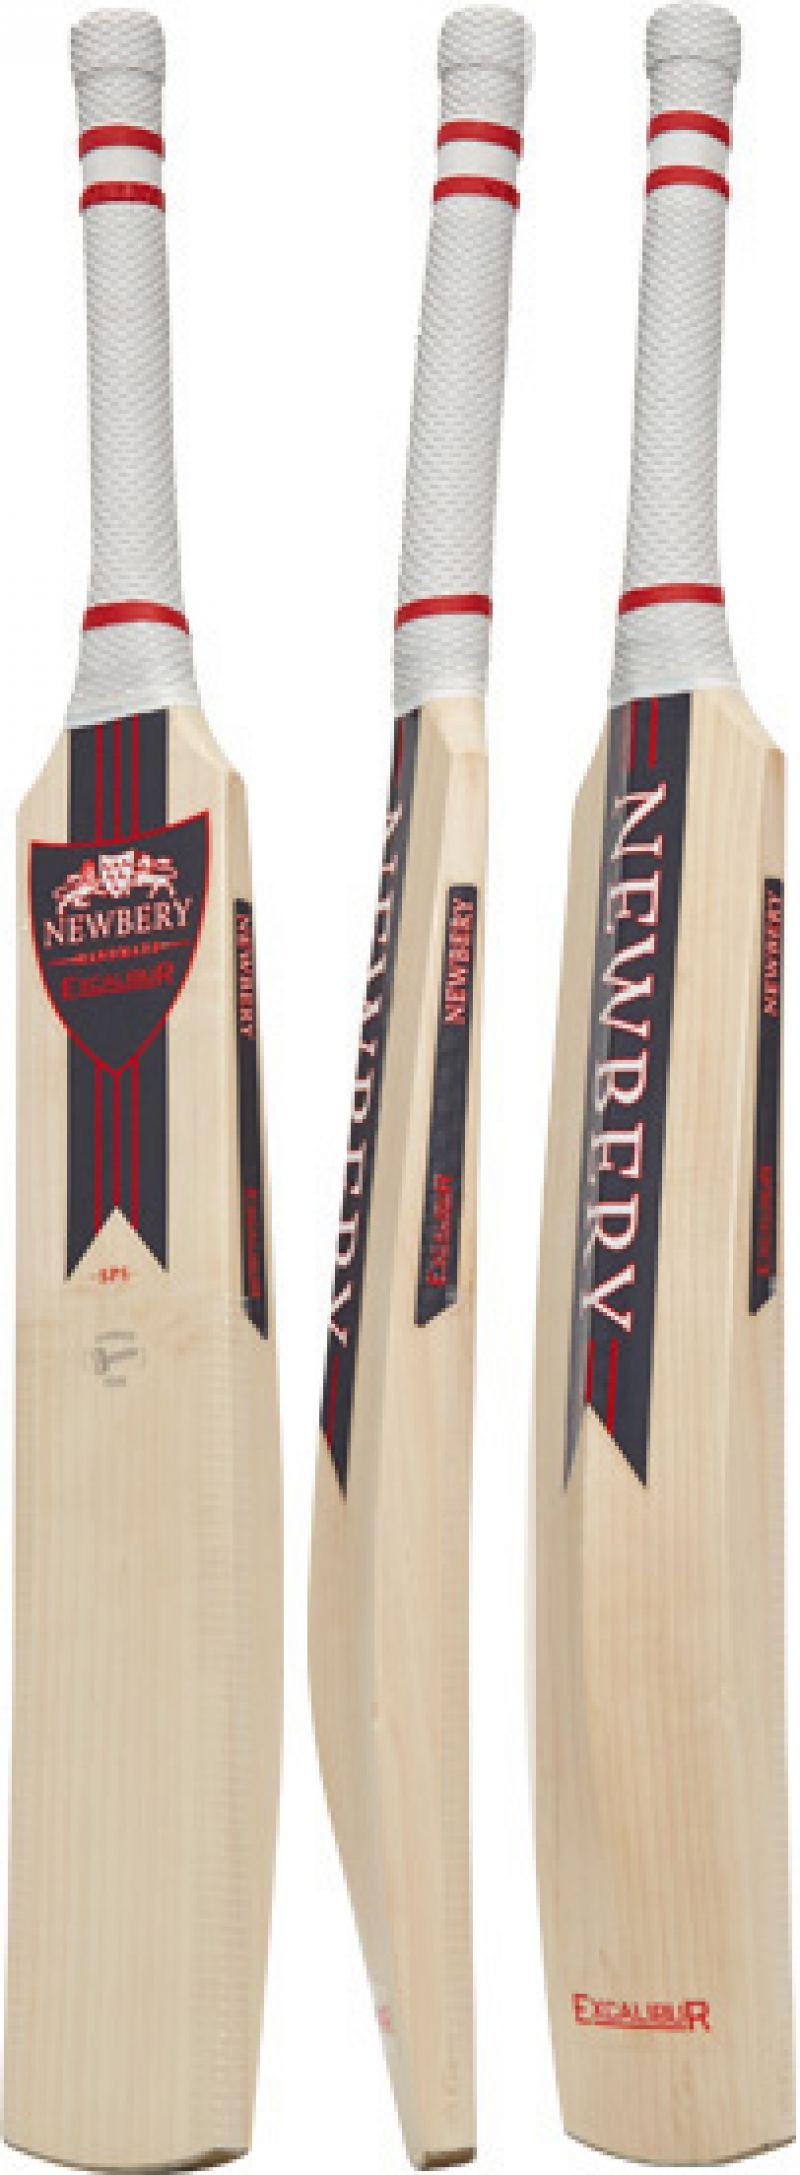 Newbery Excalibur 5 Star Junior Cricket Bat